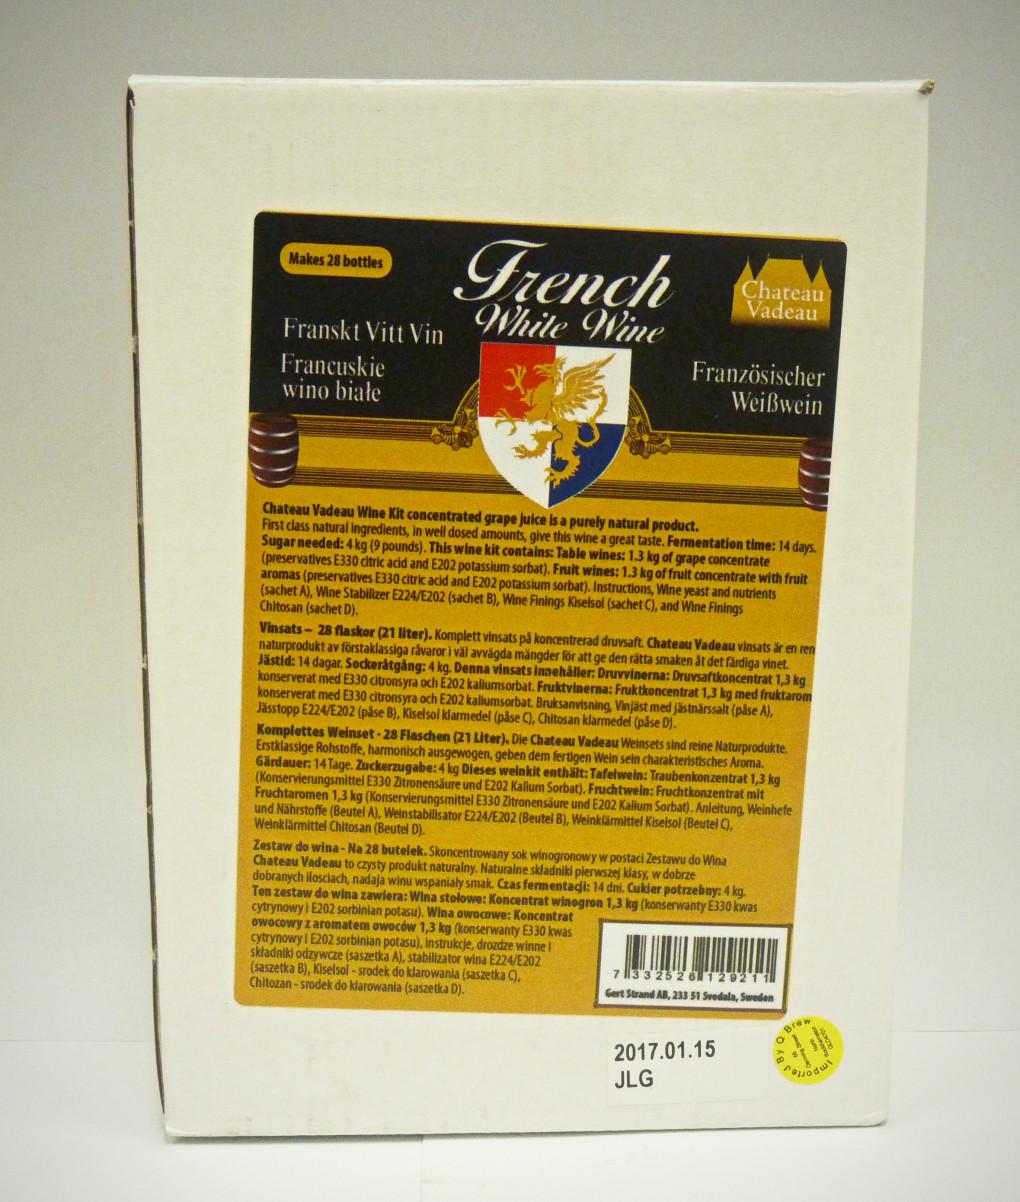 Chateau Vadeau French White Wine Kit